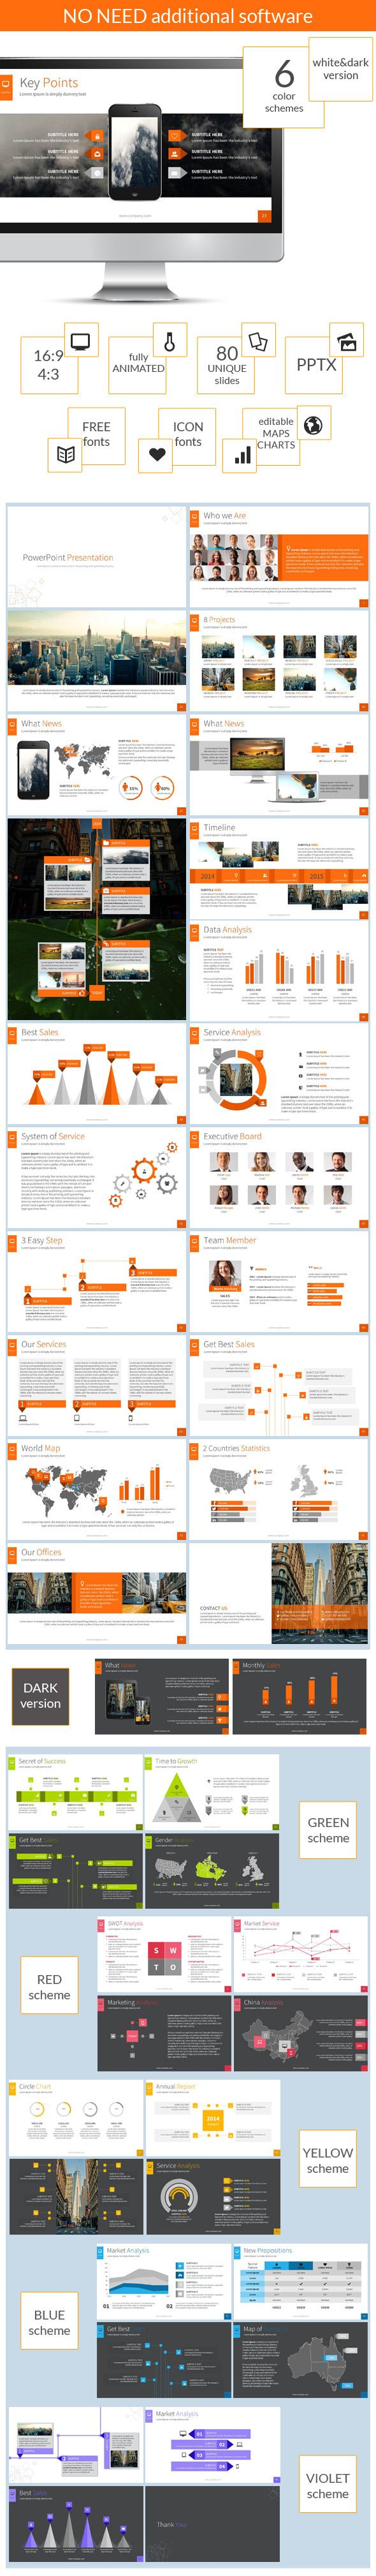 PowerPoint Presentation http://graphicriver.net/item/powerpoint-presentation-/8795773